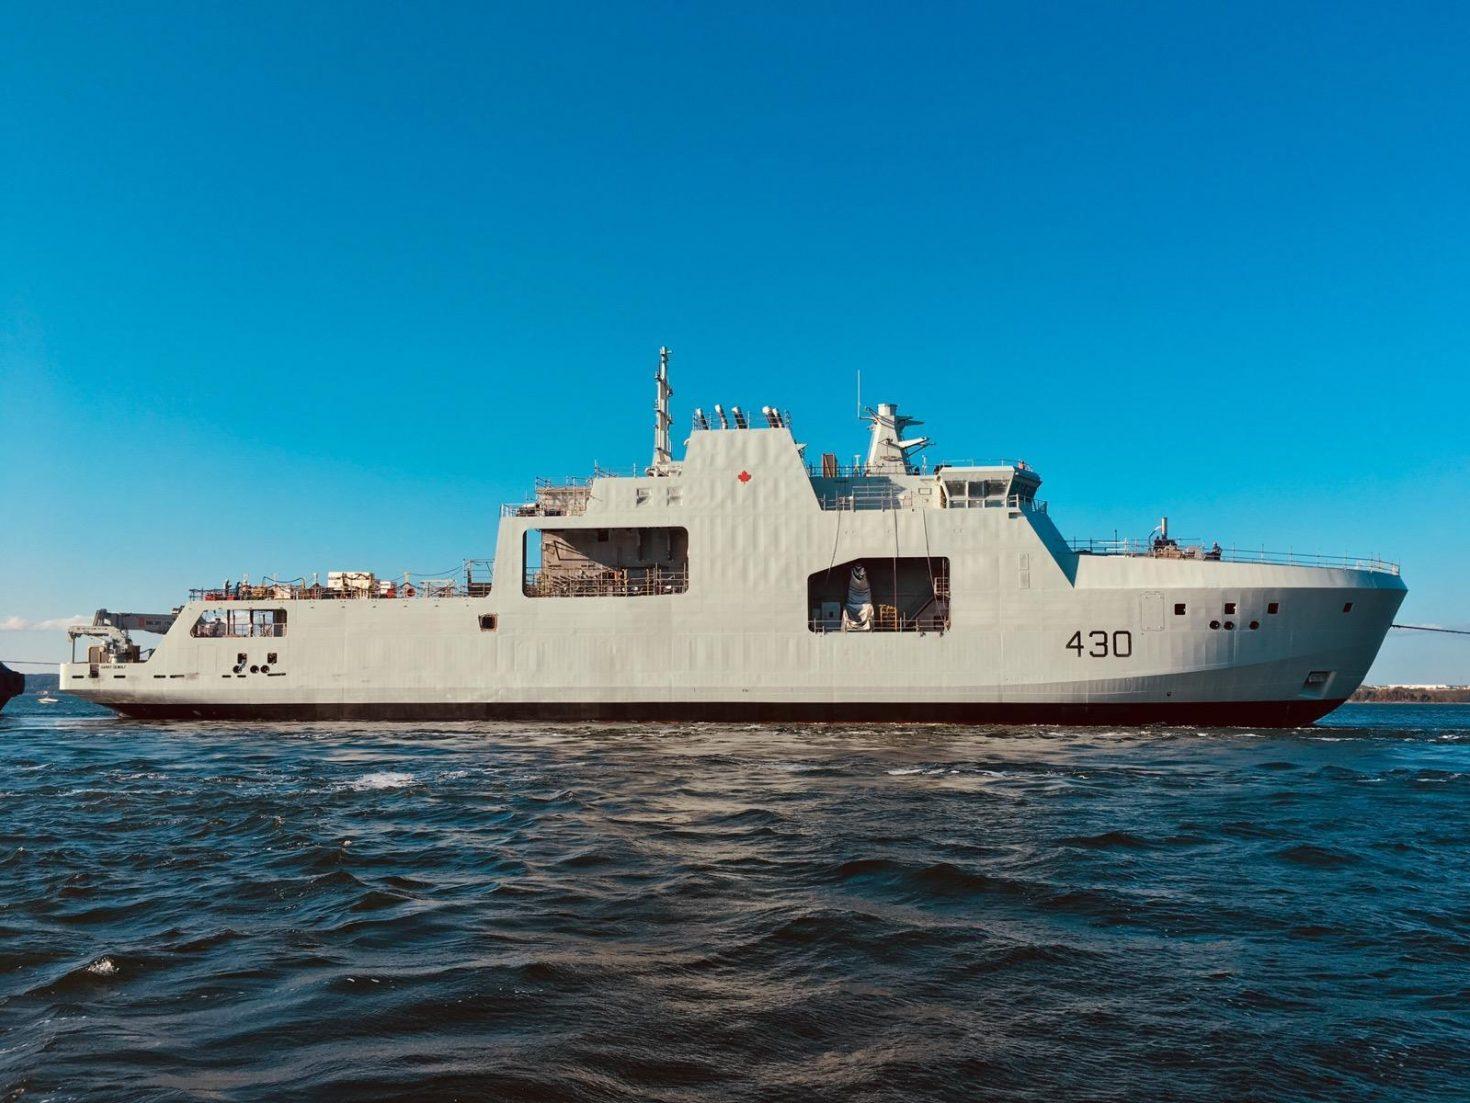 Coast Guard to get two new Arctic patrol ships | Nunatsiaq News